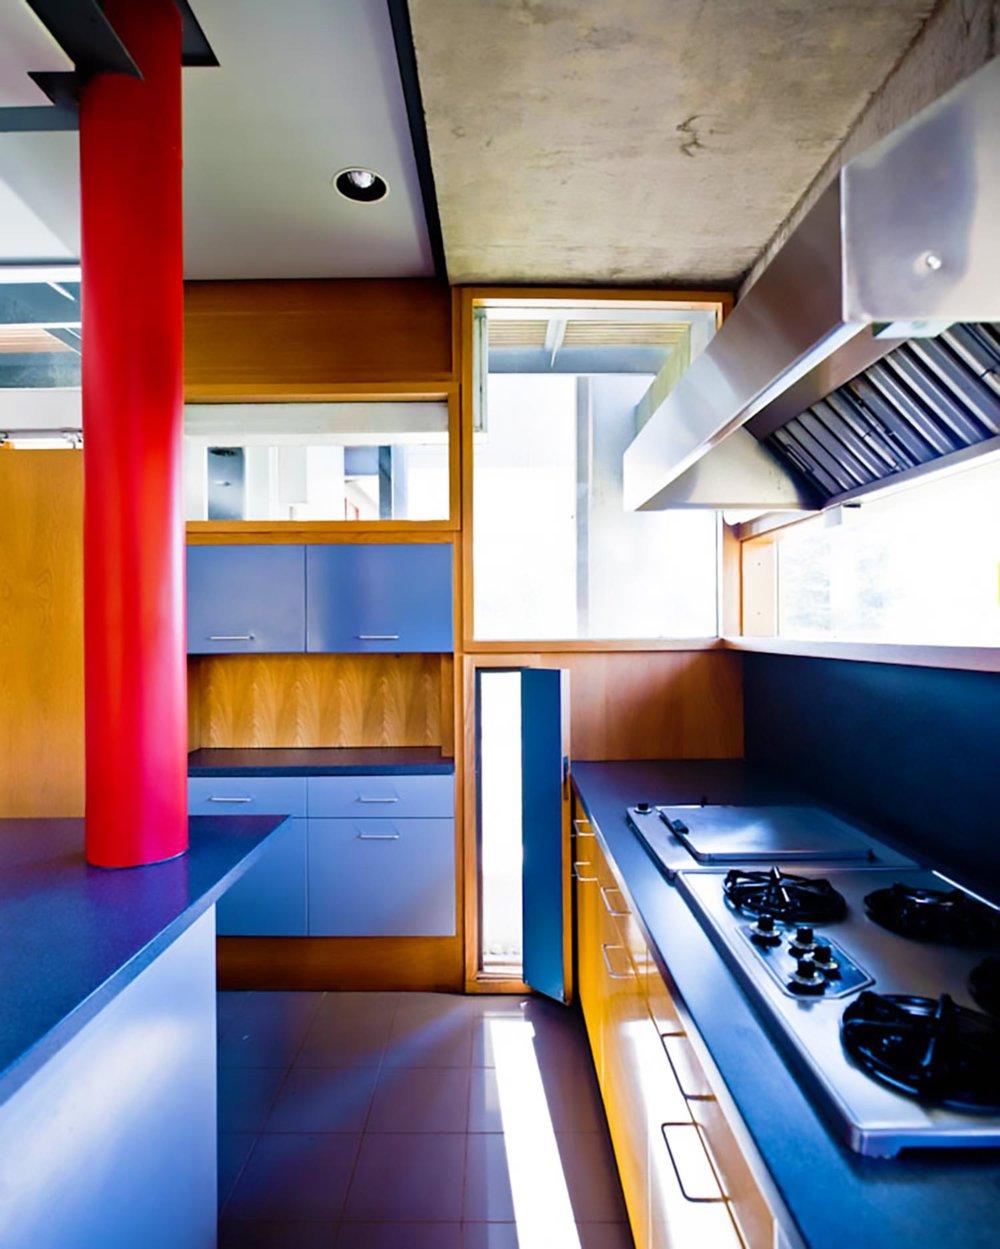 mh-kitchen-detail-SS.jpg